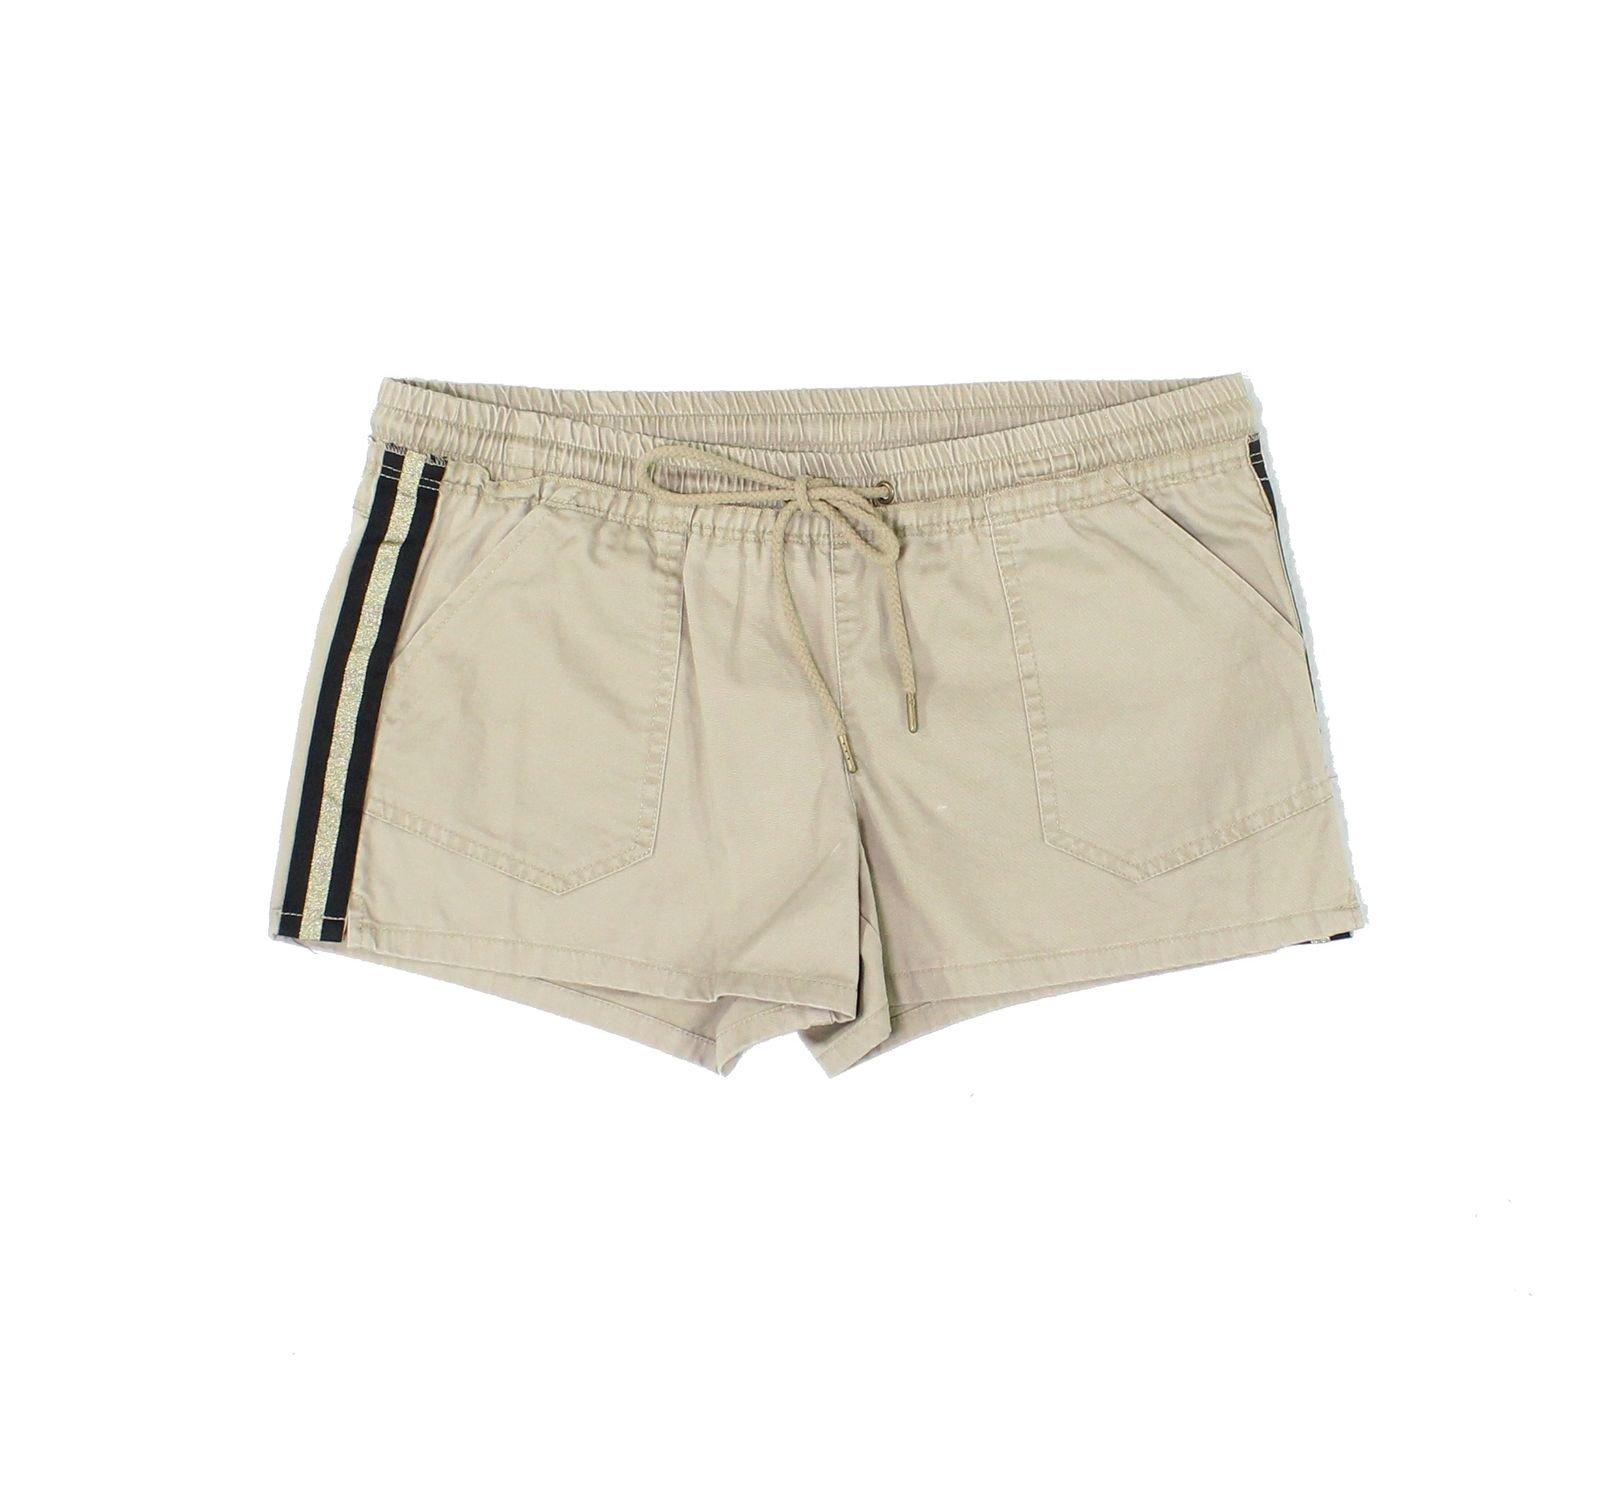 Jolt 27W Junior Metallic Stripe-Trim Drawstring Shorts Beige 5